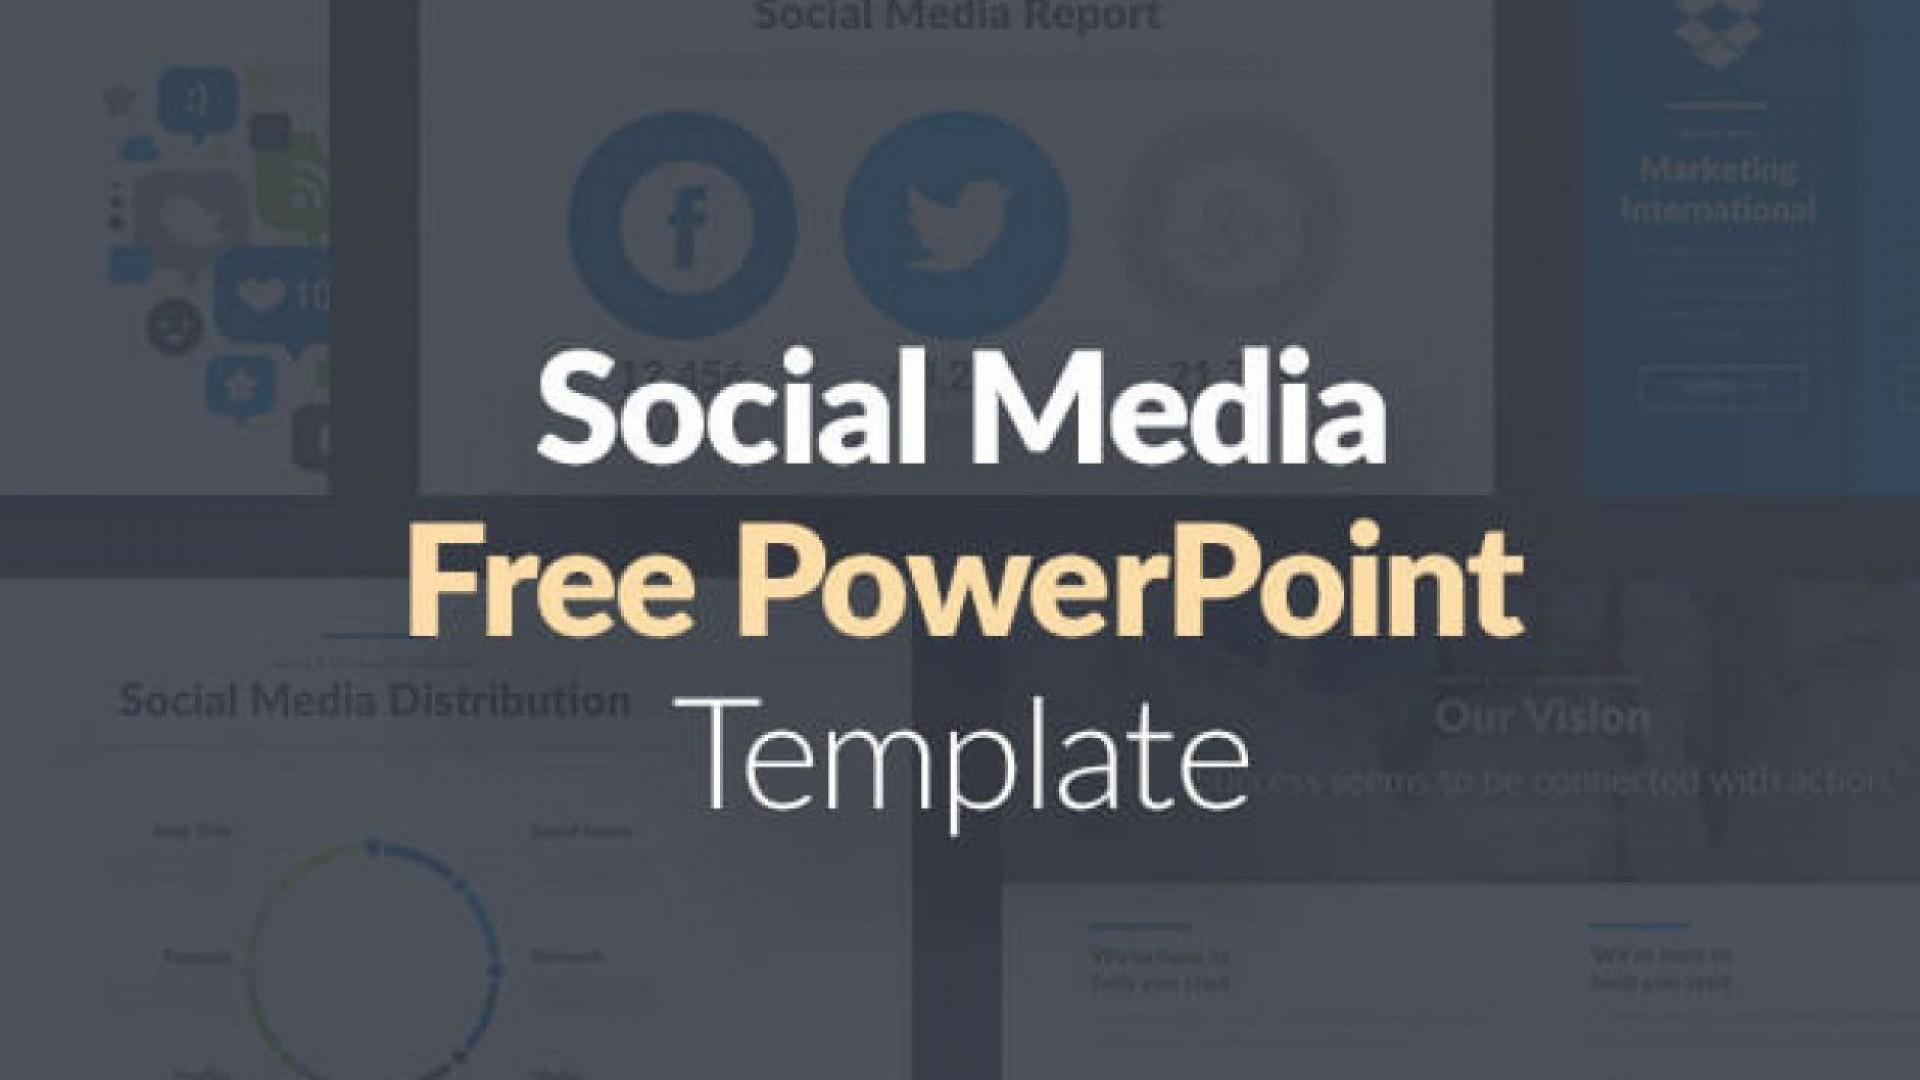 004 Wondrou Social Media Powerpoint Template Inspiration  Templates Report Free Social-media-marketing-powerpoint-template1920